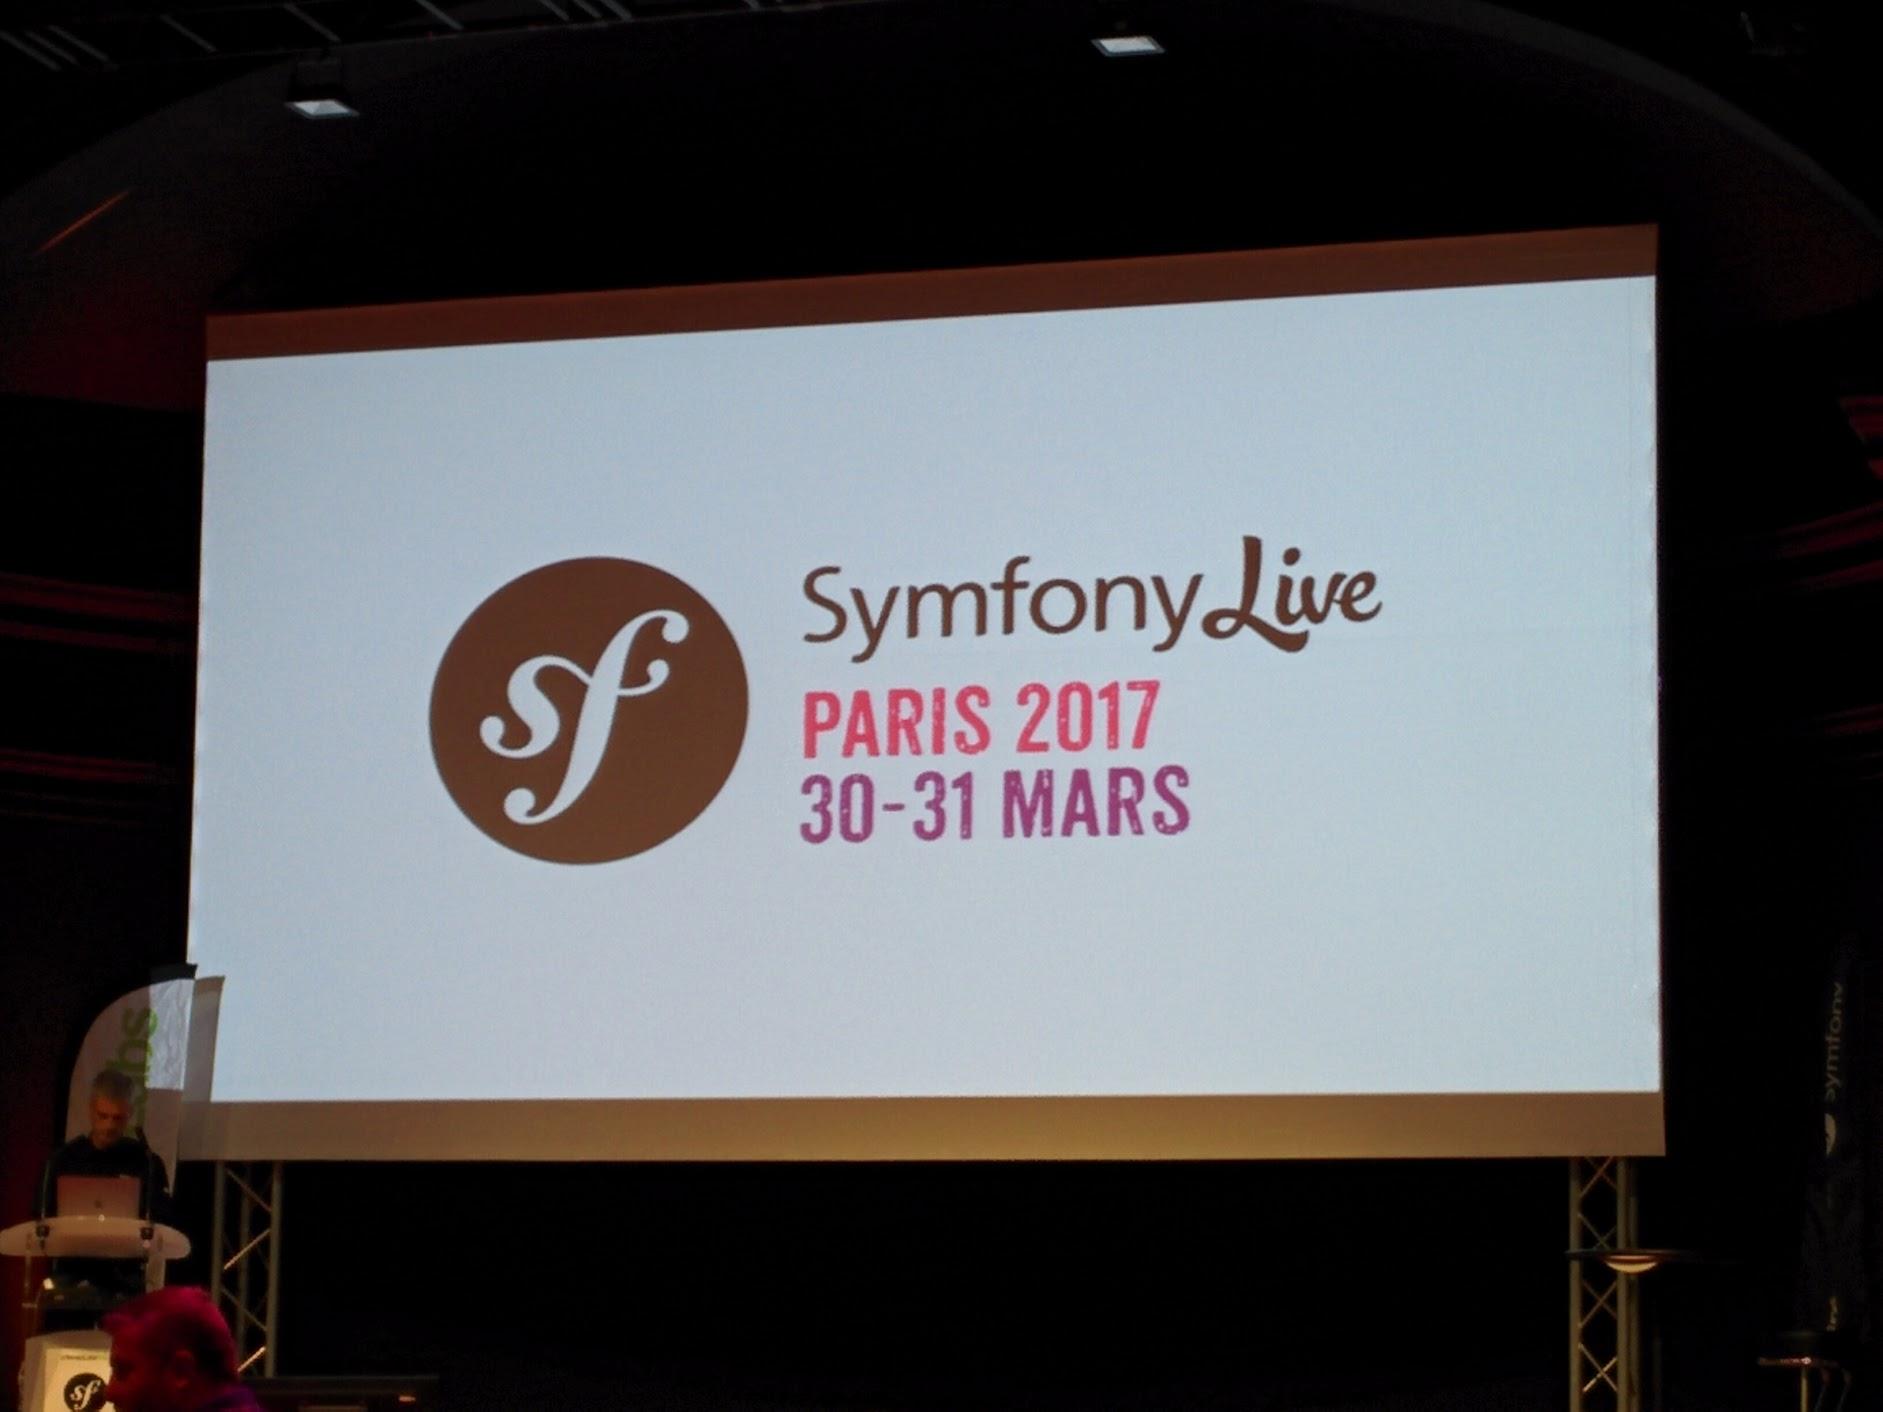 Symfony Live Paris 2017